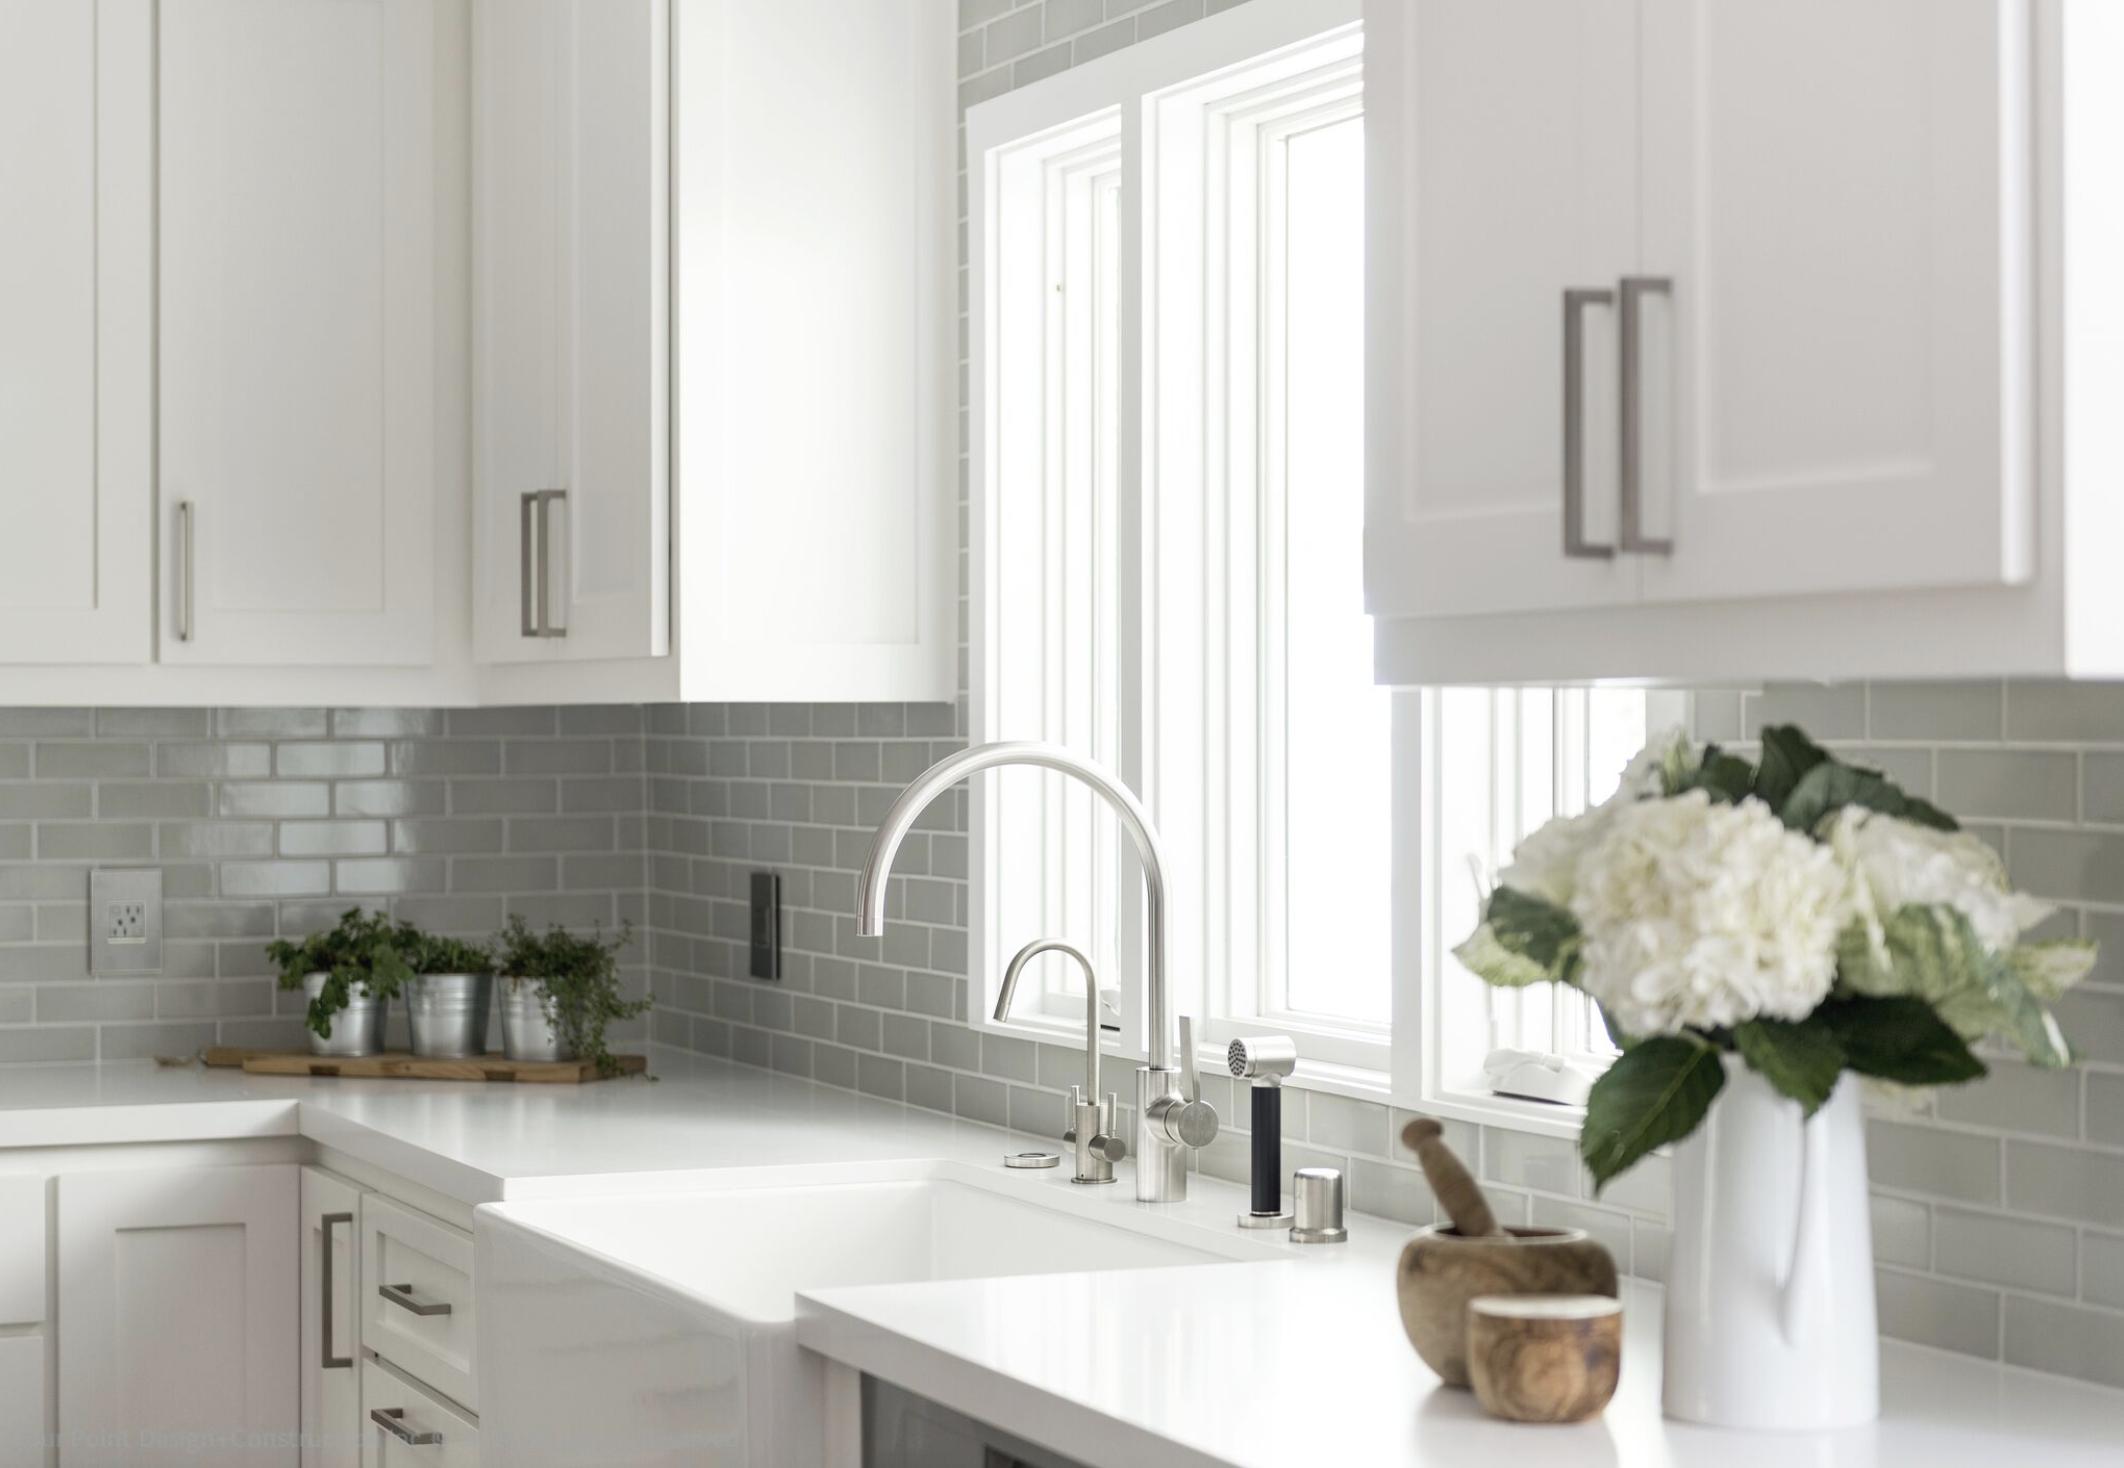 A Calabasas, CA kitchen designed by LA based, www.fourpointdesignbuild.com